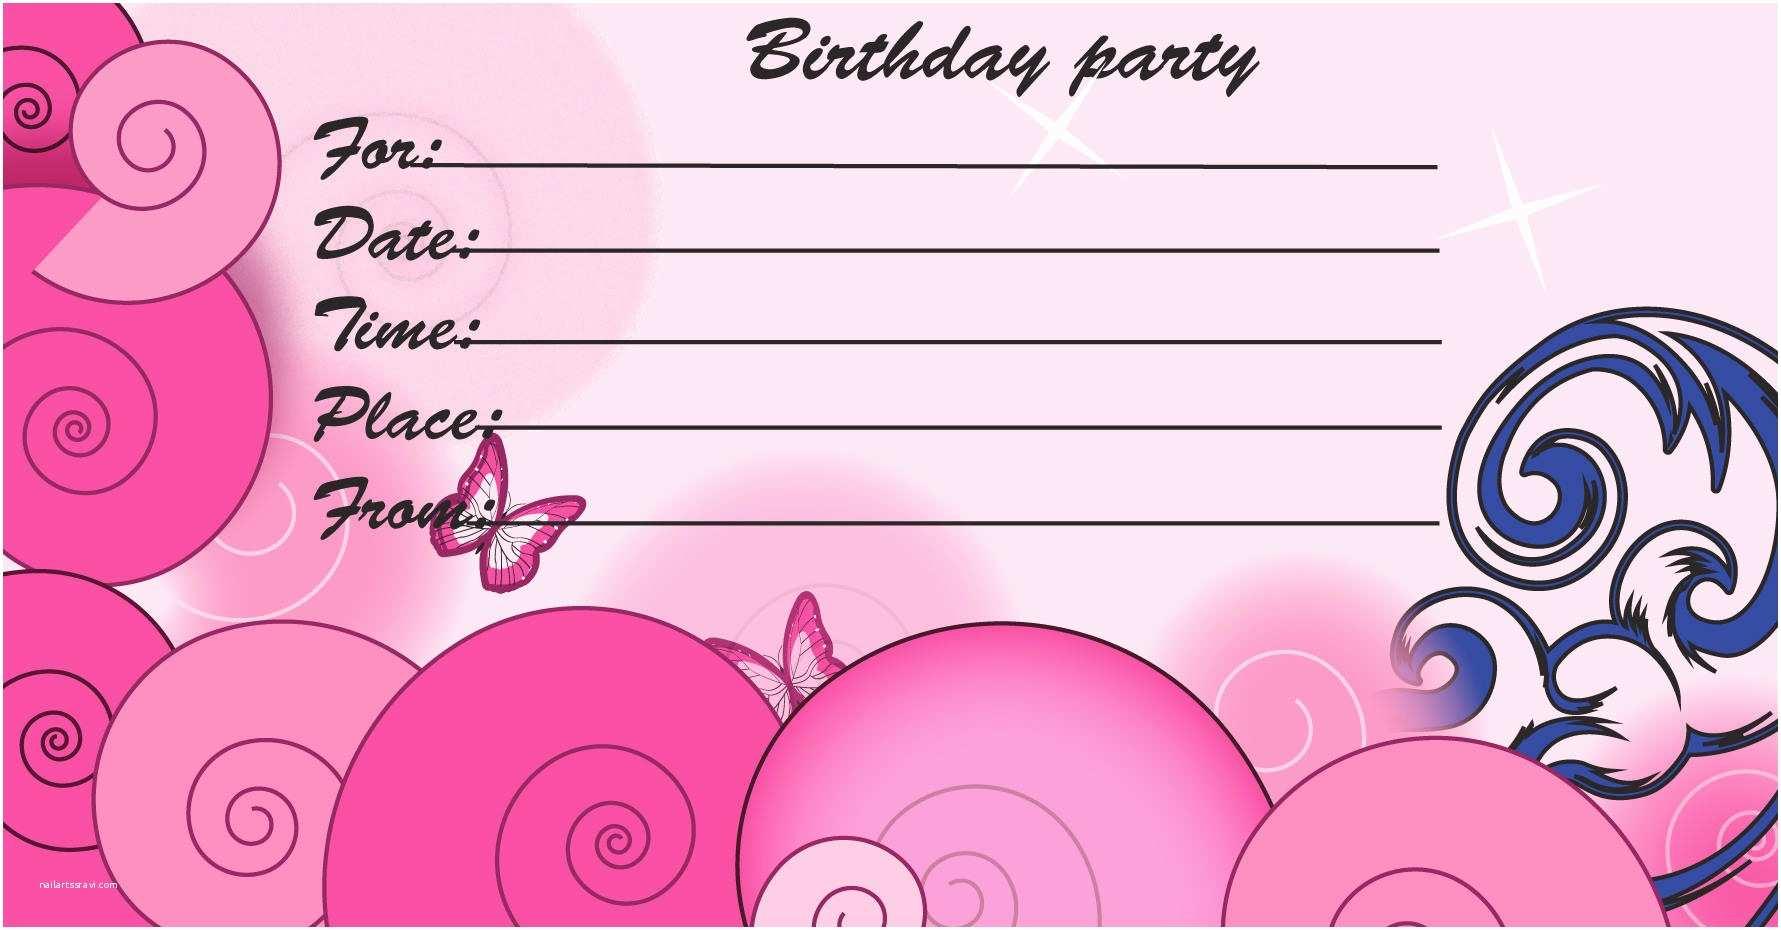 Birthday Invitations Templates 19 Inspirational Birthday Party Invitation Cards and